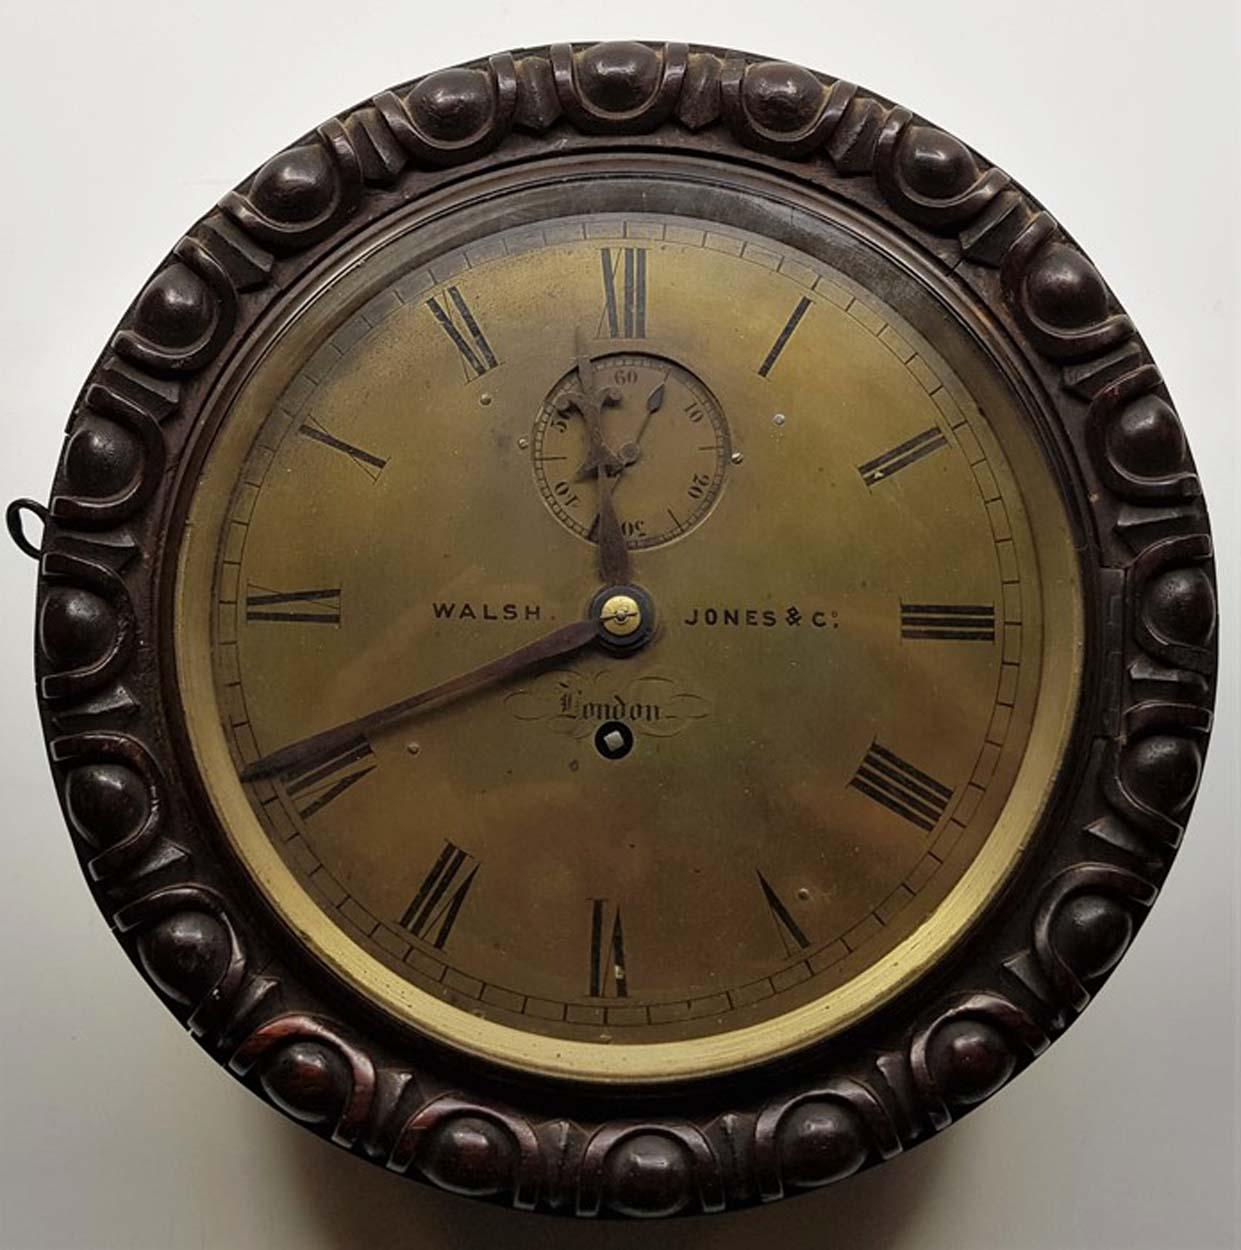 Walsh Jones & Co Fusee Marine Clock